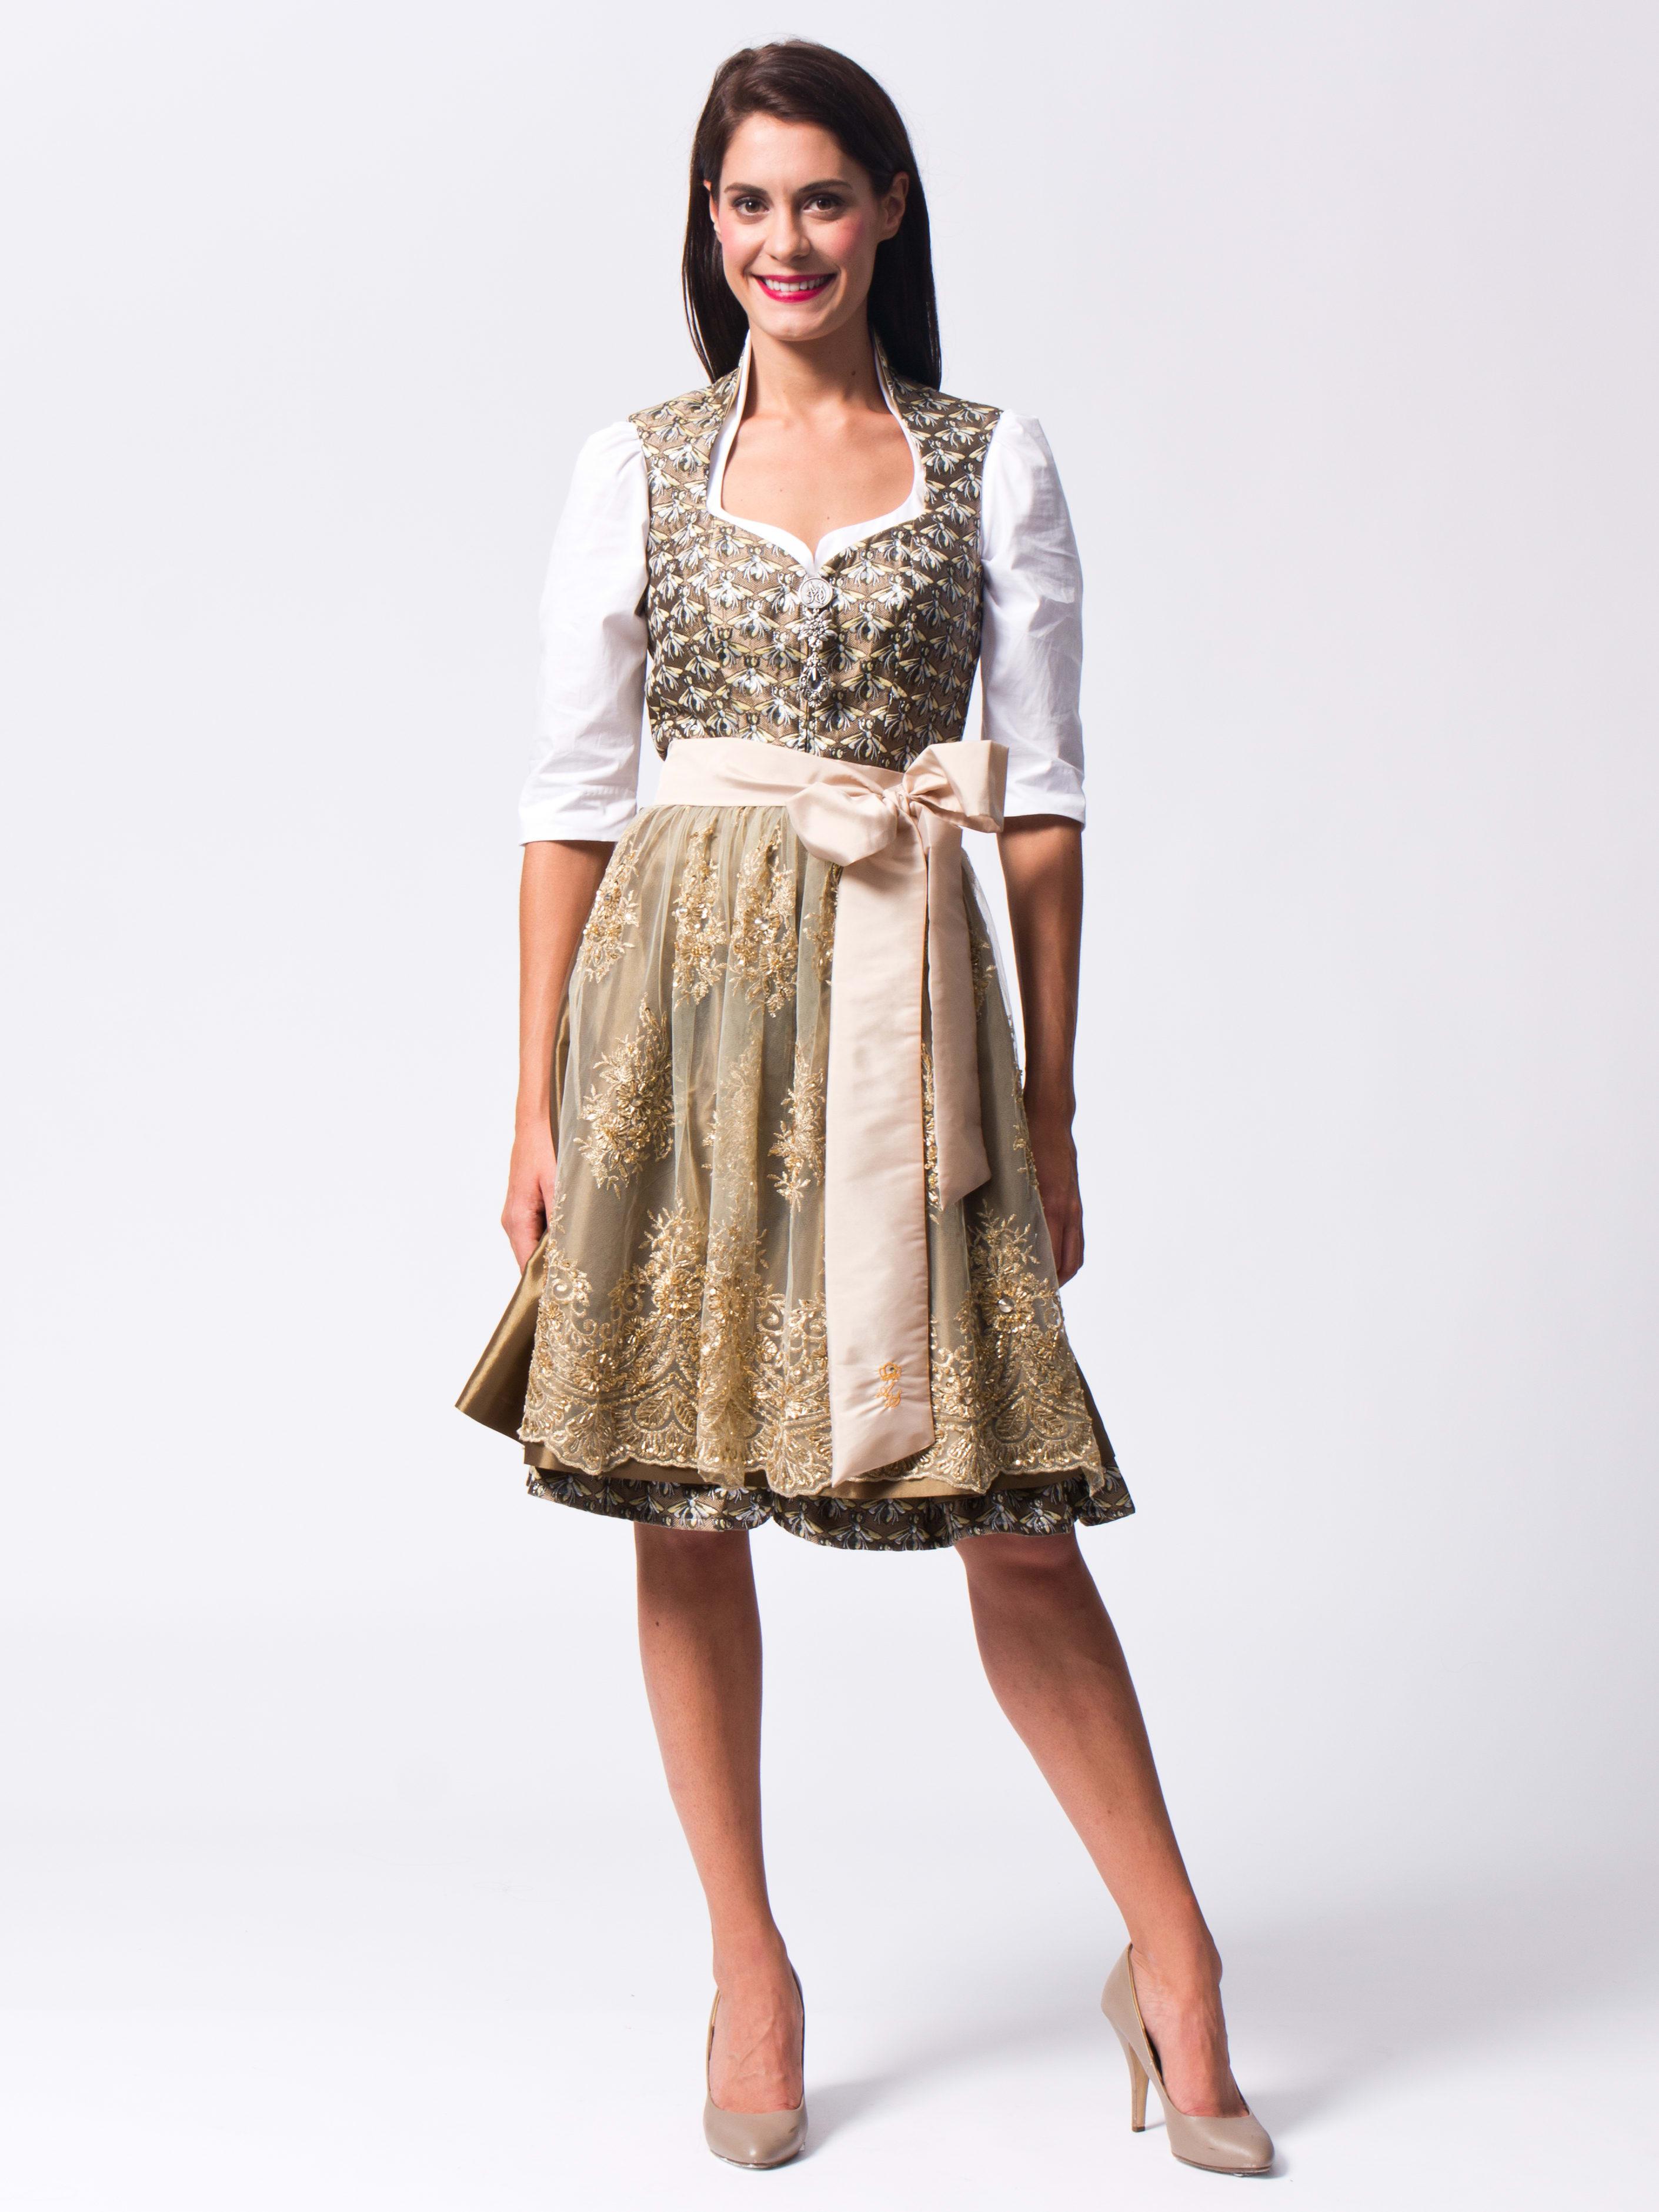 cd43d6c13697c5 limango Outlet: Mode, Schuhe, Kinderkleidung bis -80% günstig kaufen